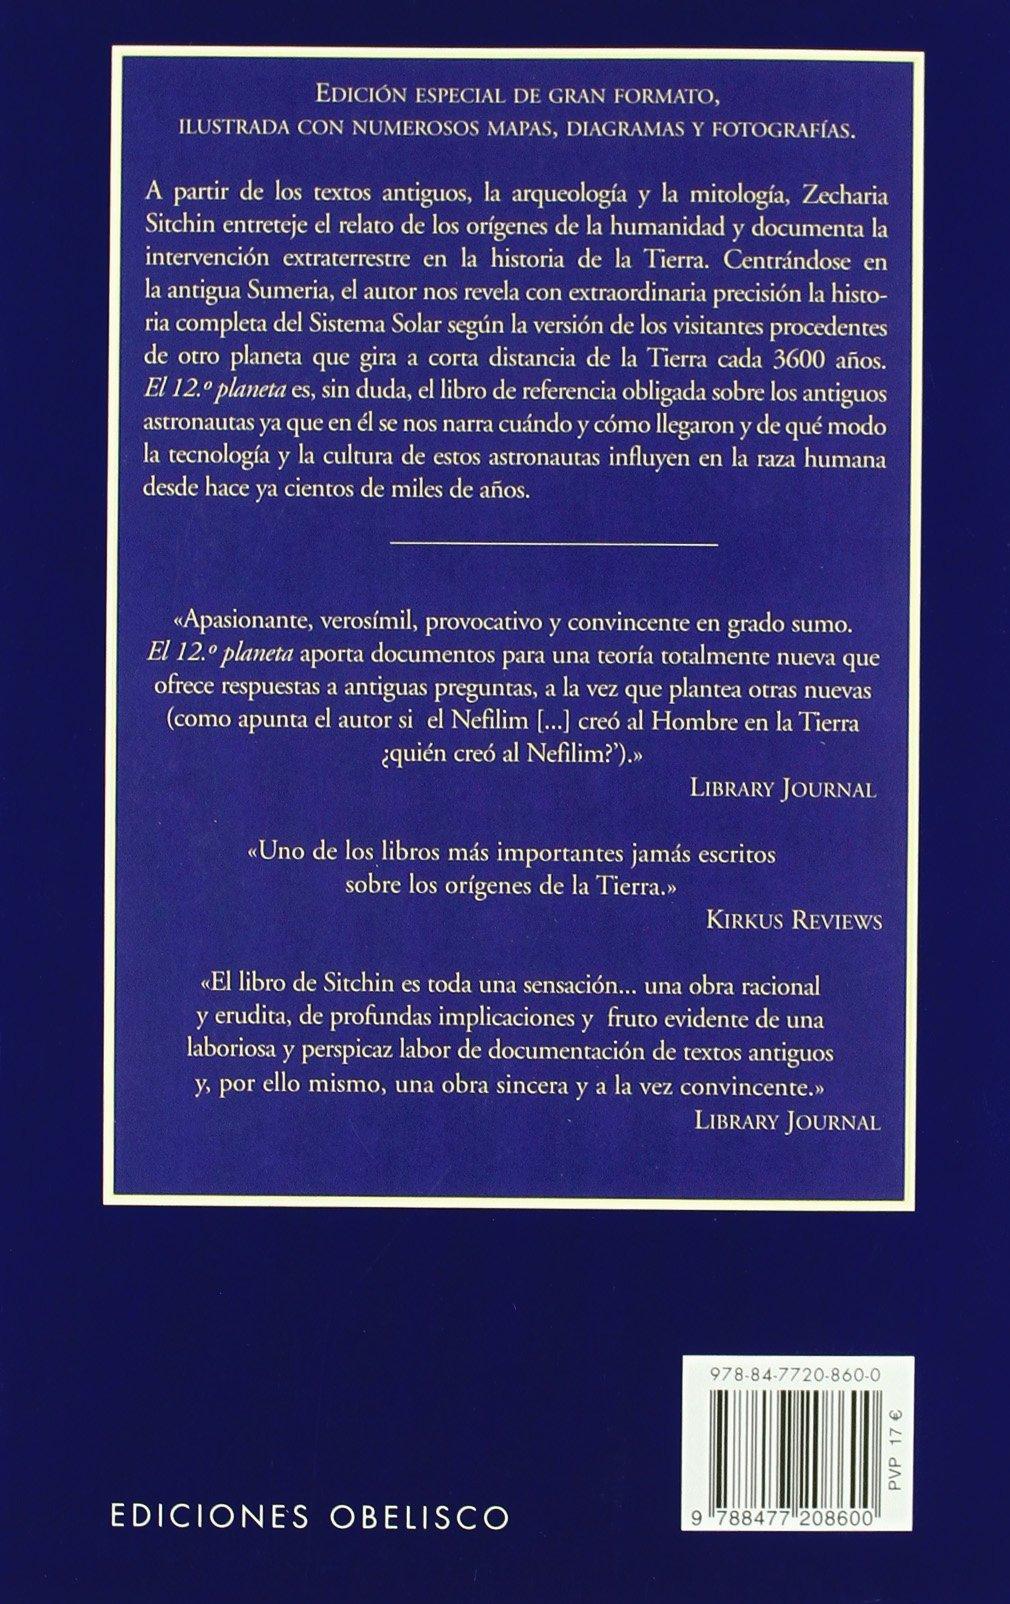 El duodecimo planeta cronicas de la tierra 1 zecharia sitchin 9788477208600 amazon com books